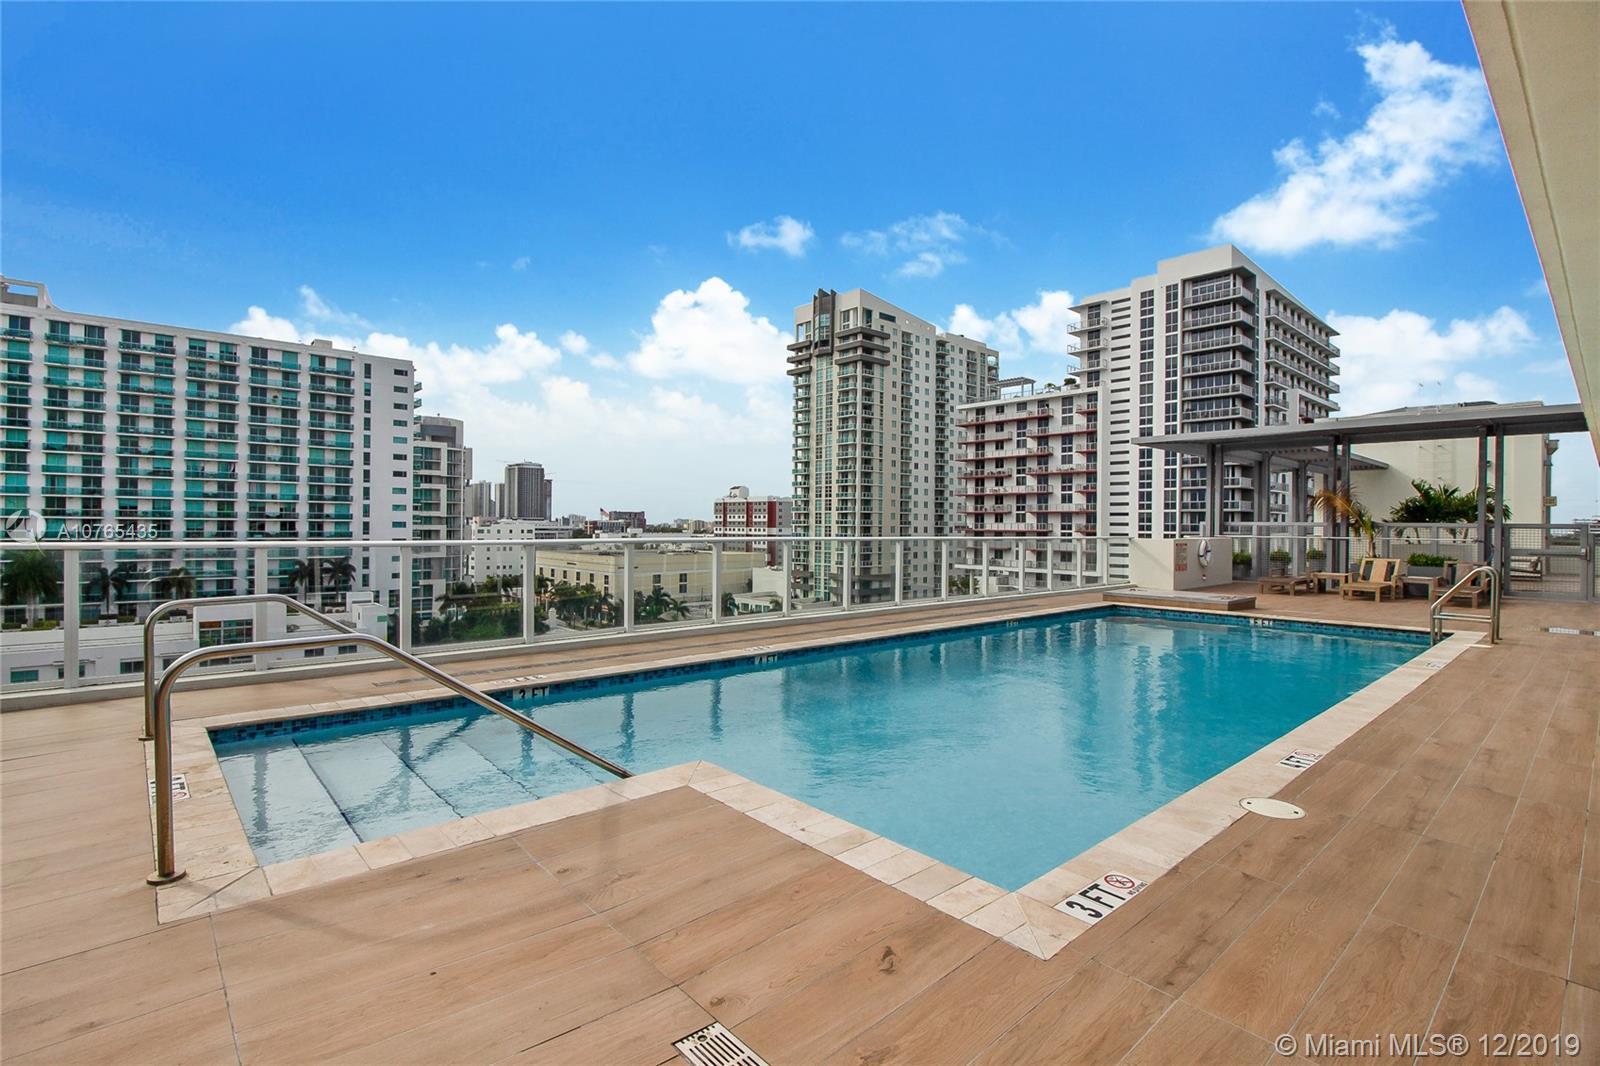 26 Edgewater - Квартиры на продажу в Майами